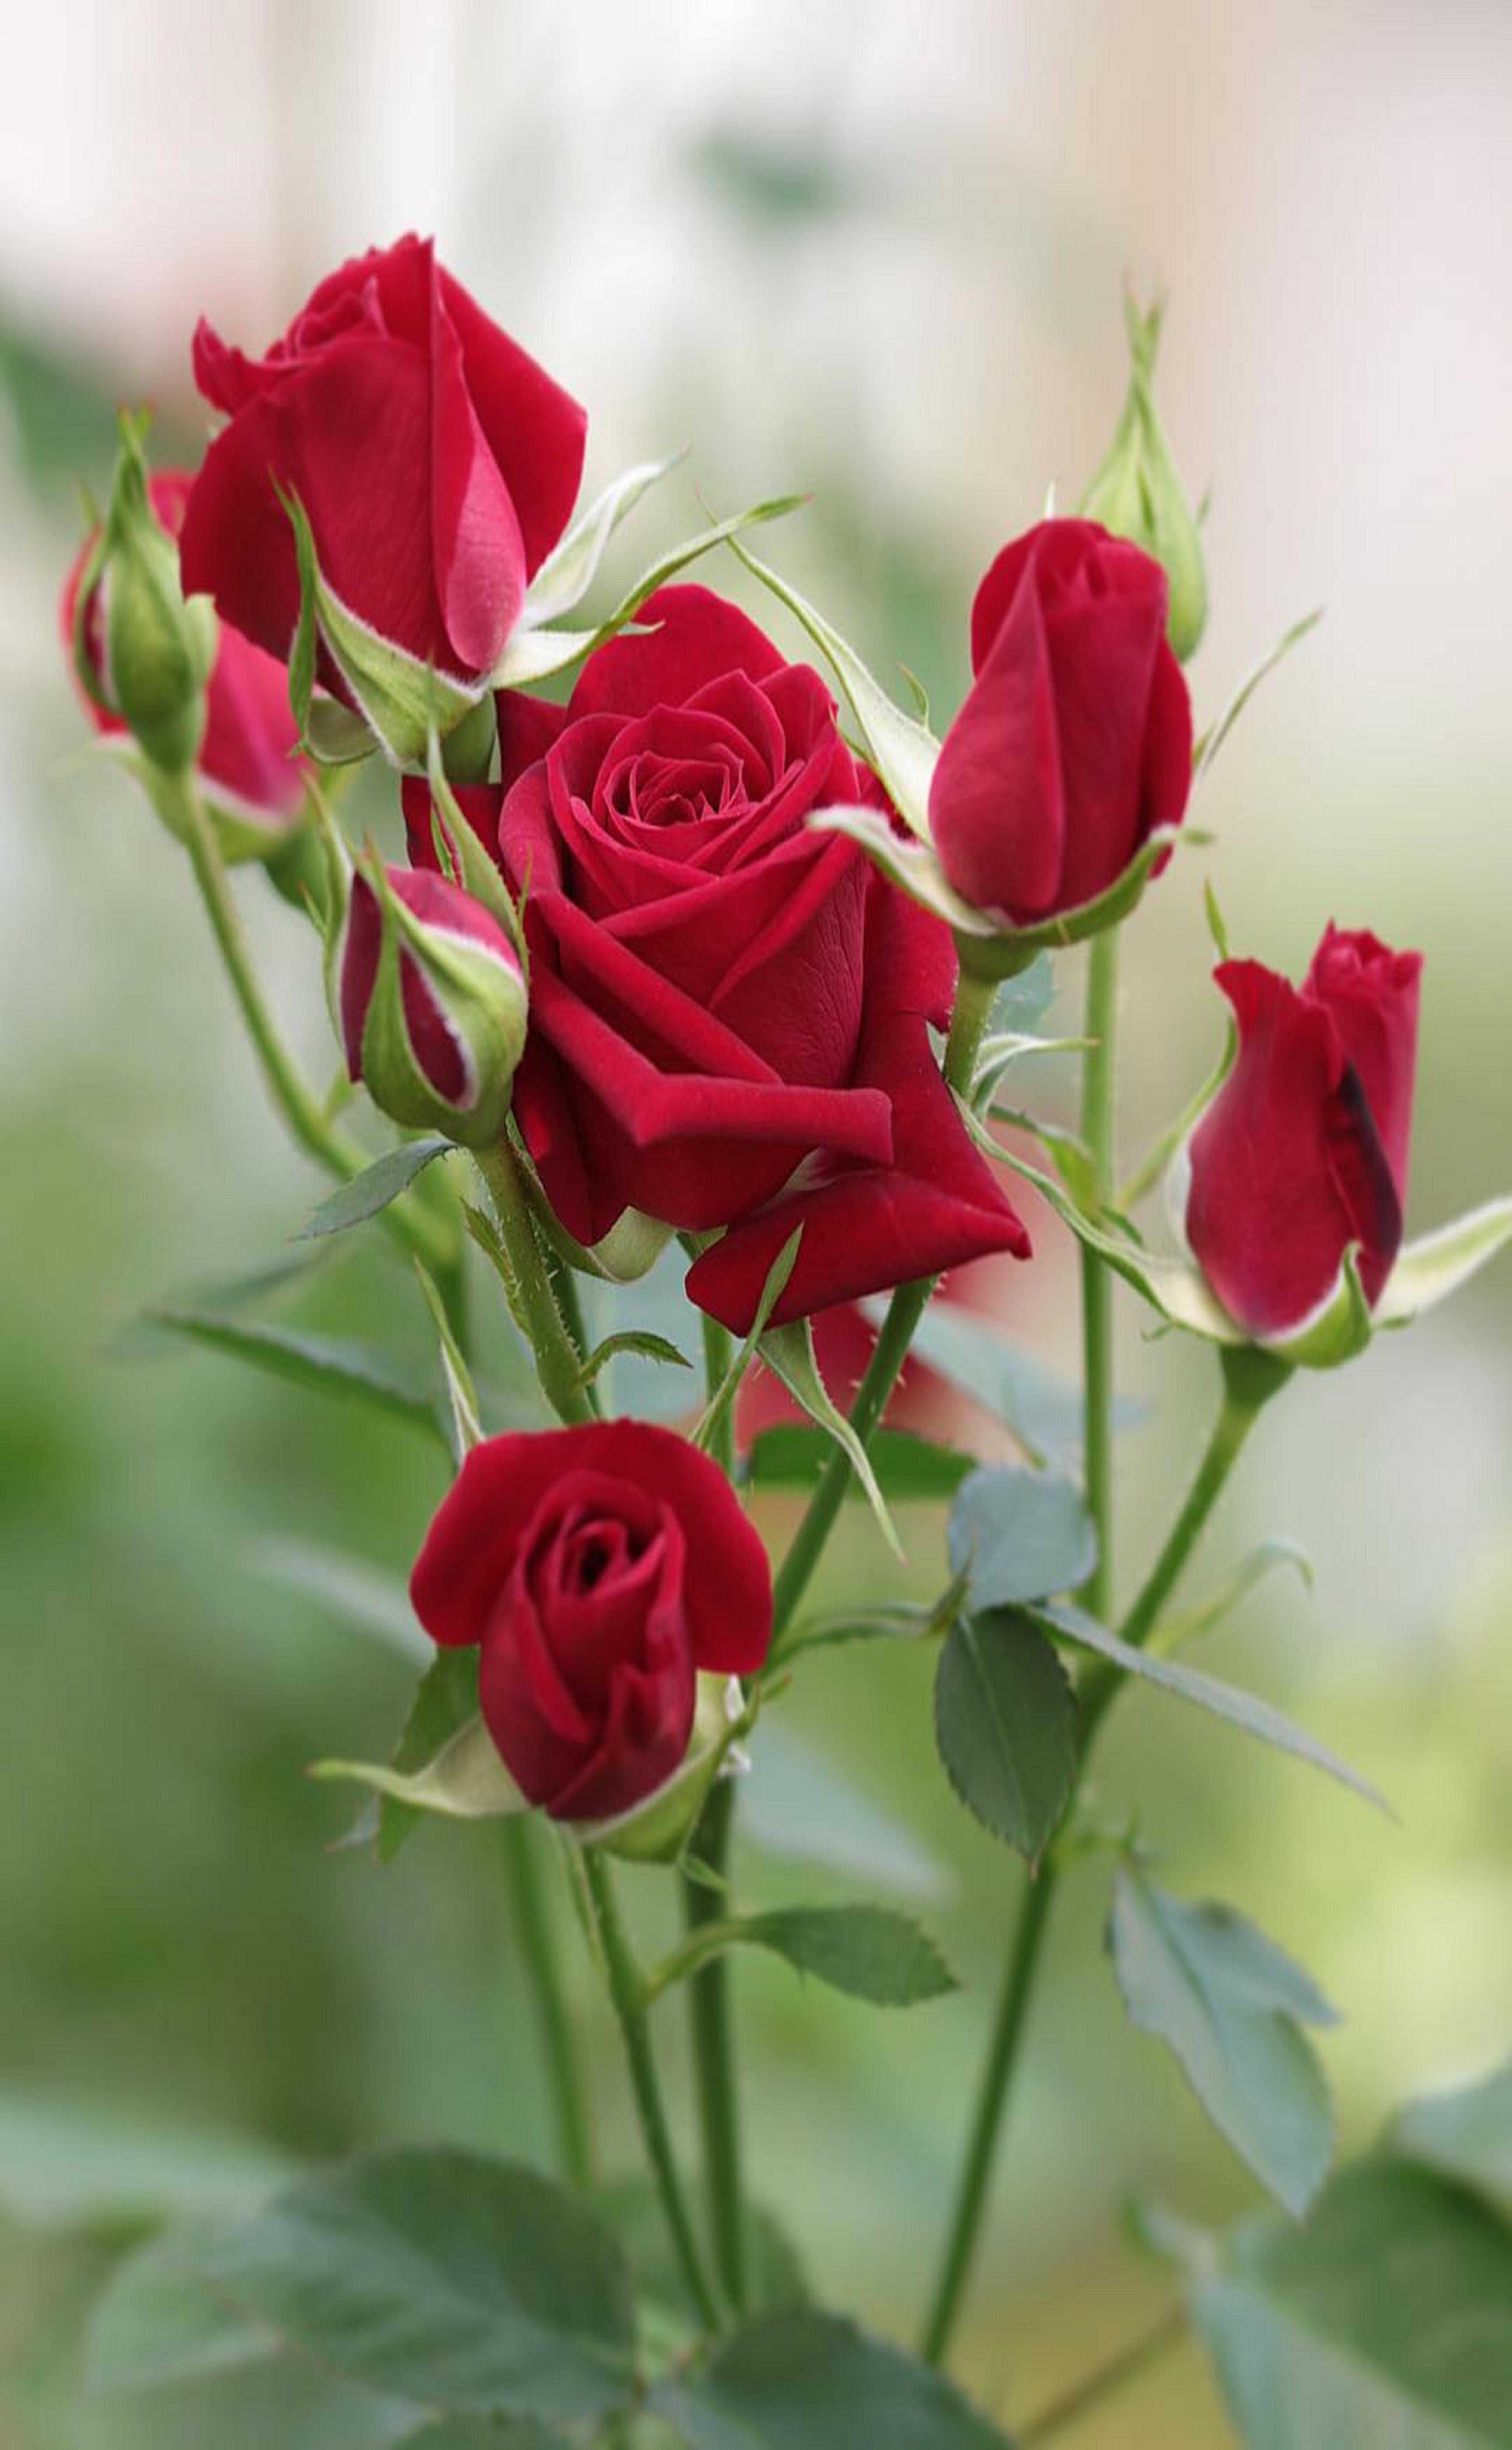 Pin by ivanka kostova on растения Beautiful rose flowers